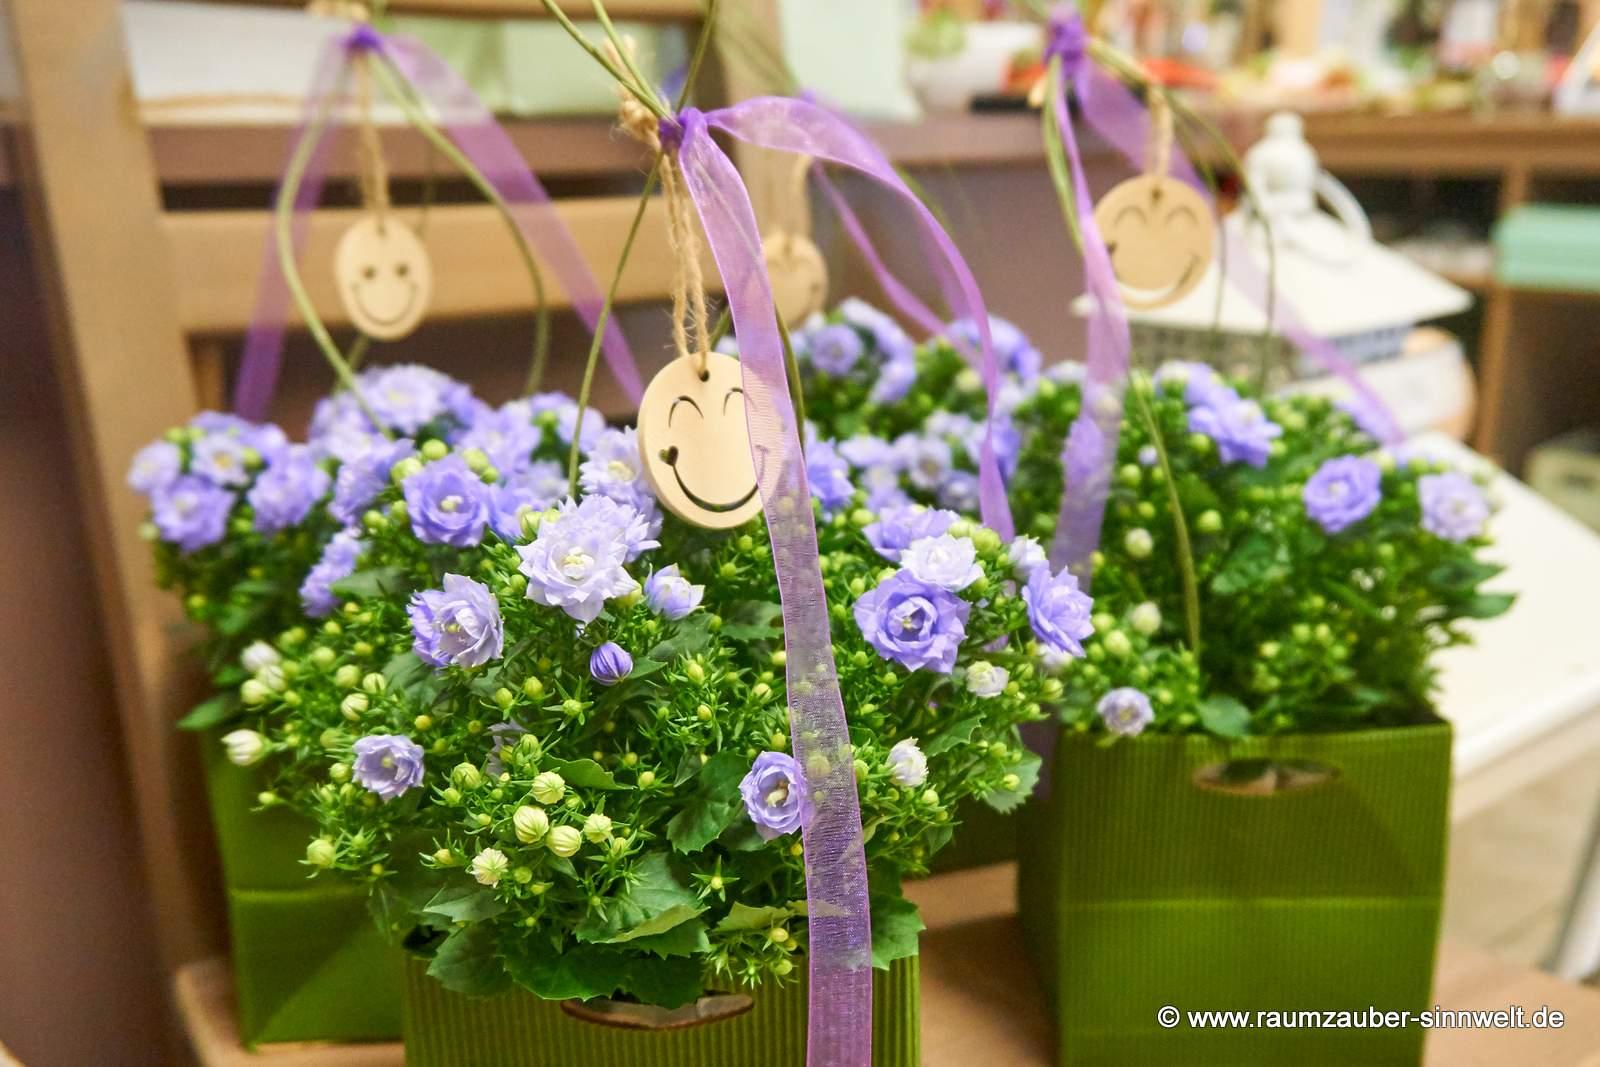 Glockenblumen mit Smily